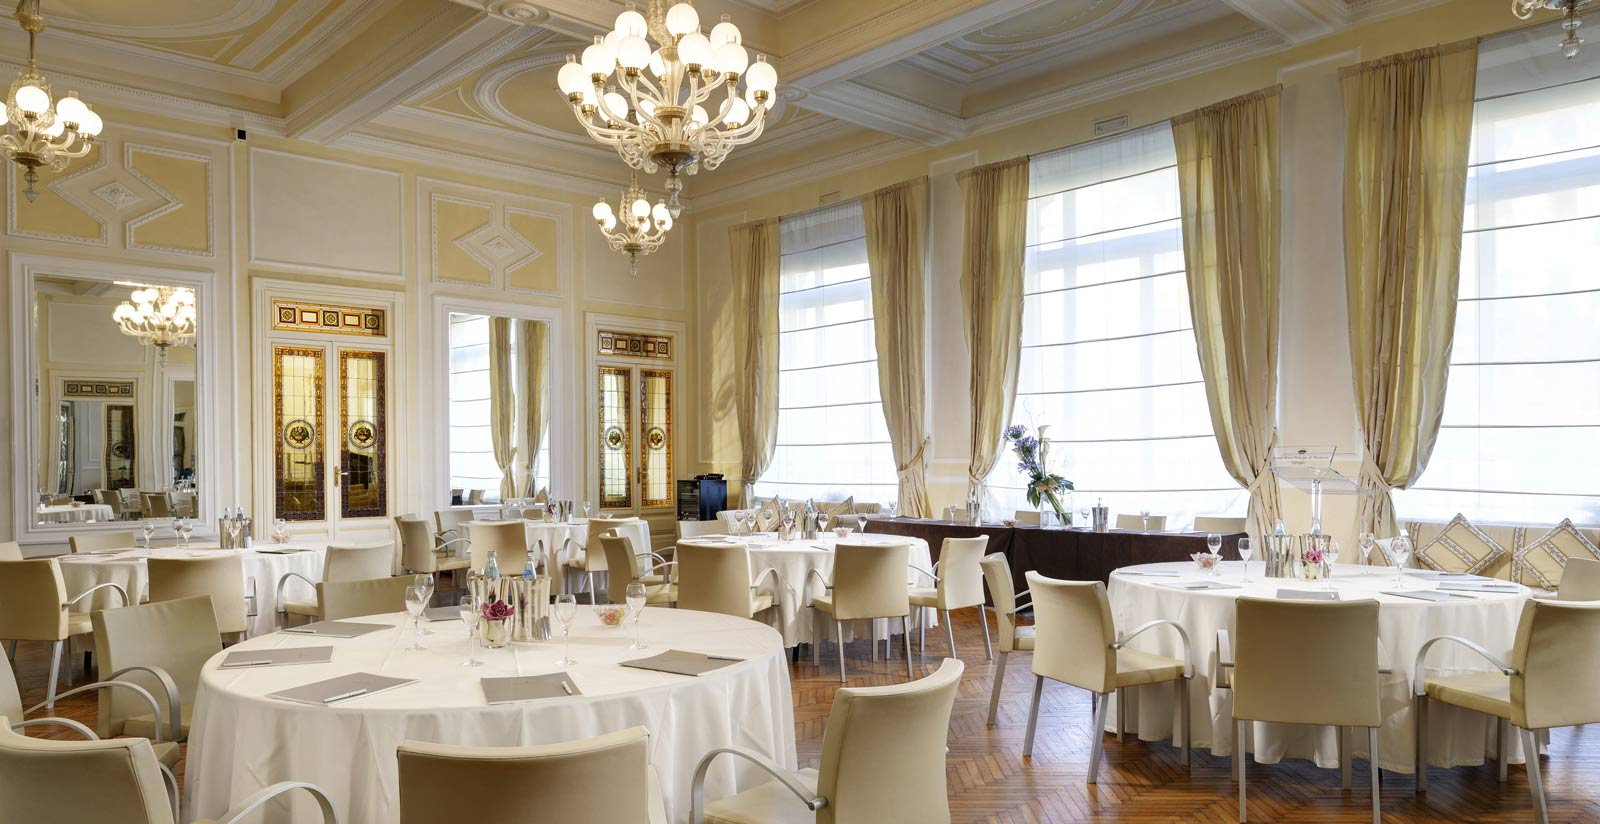 Principe Di Piemonte Hotel S Meeting Rooms And Facilities